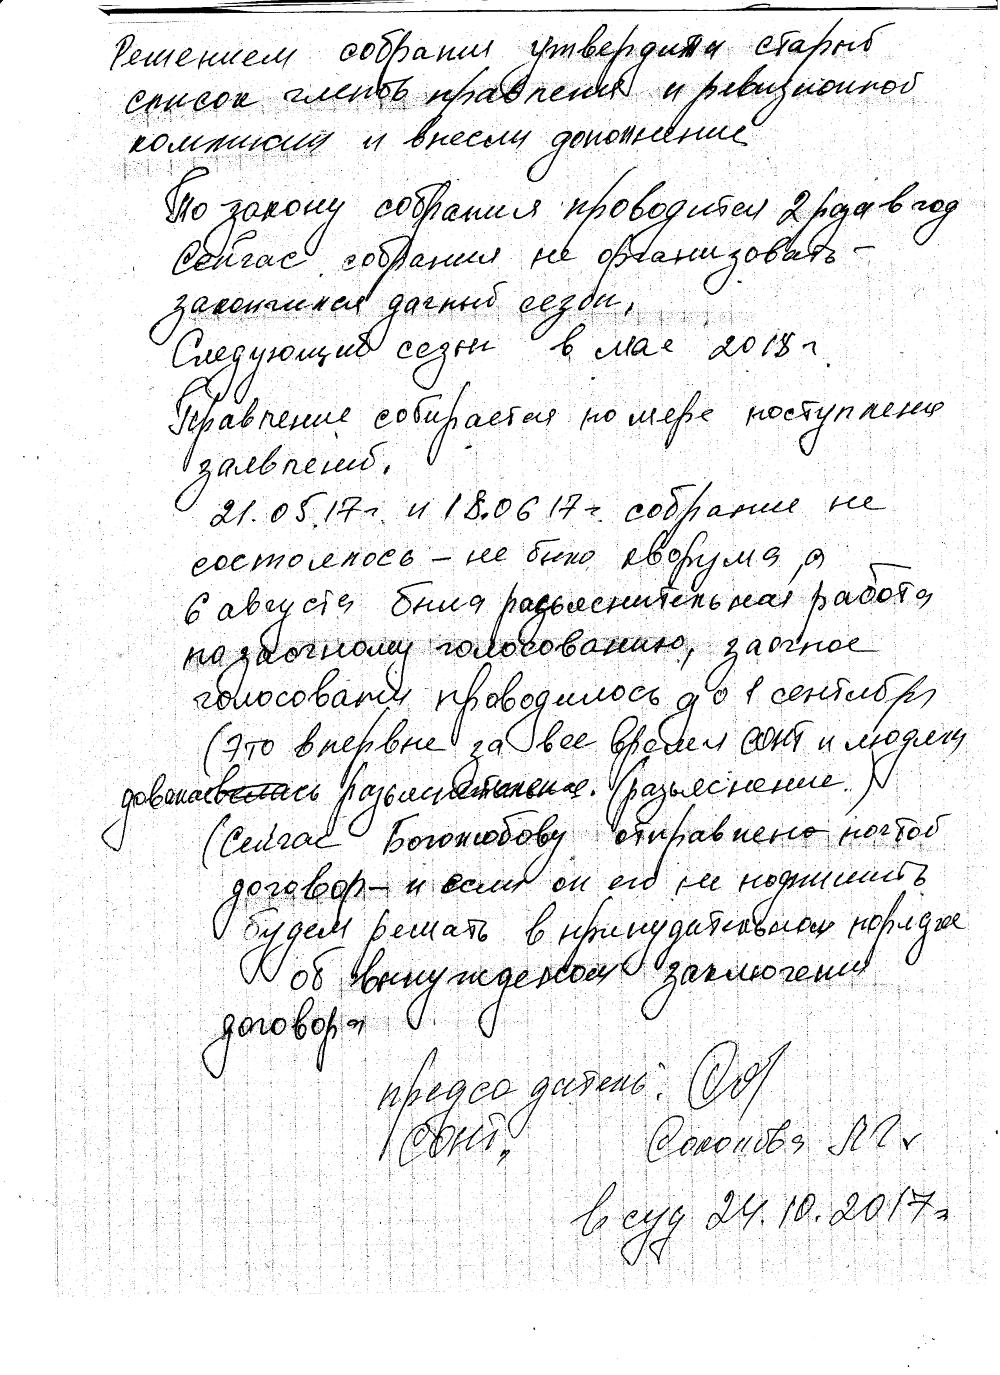 https://sontgranit.ru/forum/img/sokol/20171024-пояснения-соколовой4.png